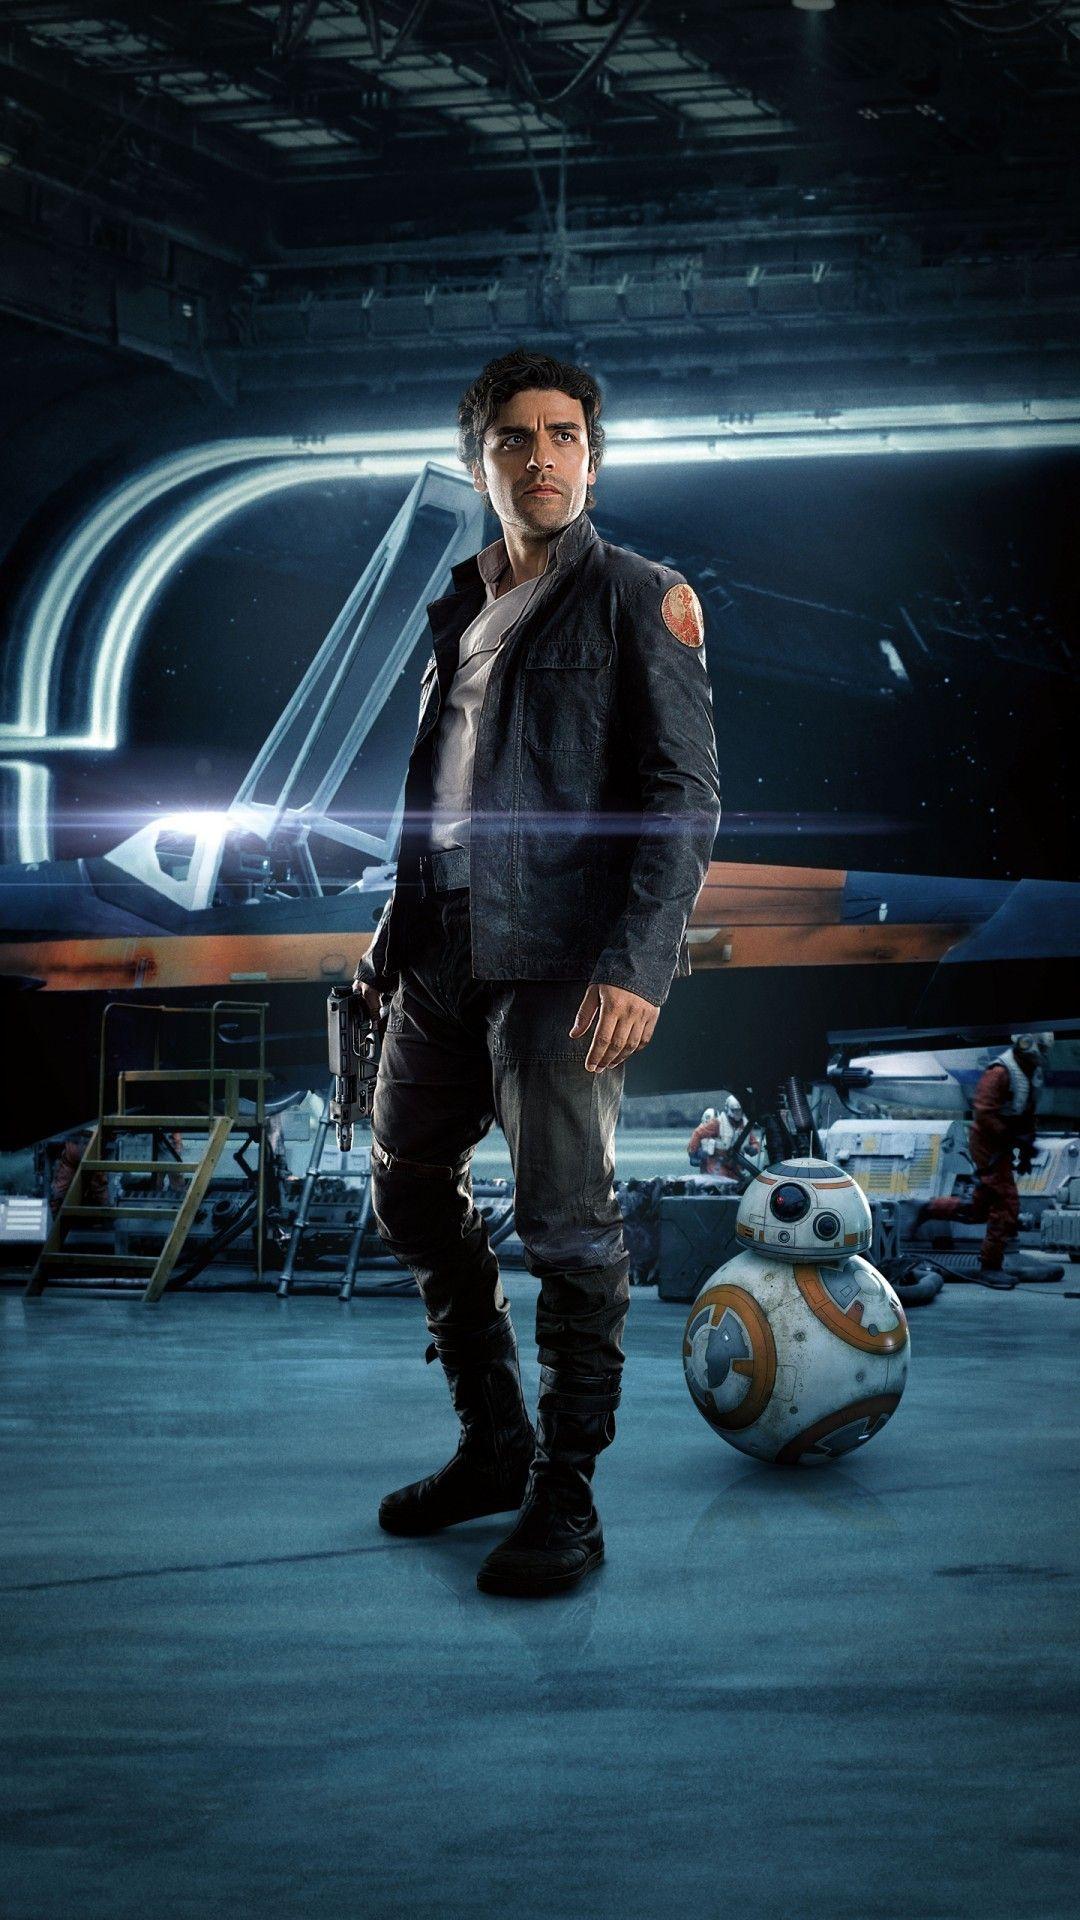 Entertainment Memorabilia Oscar Isaac Signed Star Wars Poe Dameron Photo W/ Hologram Coa